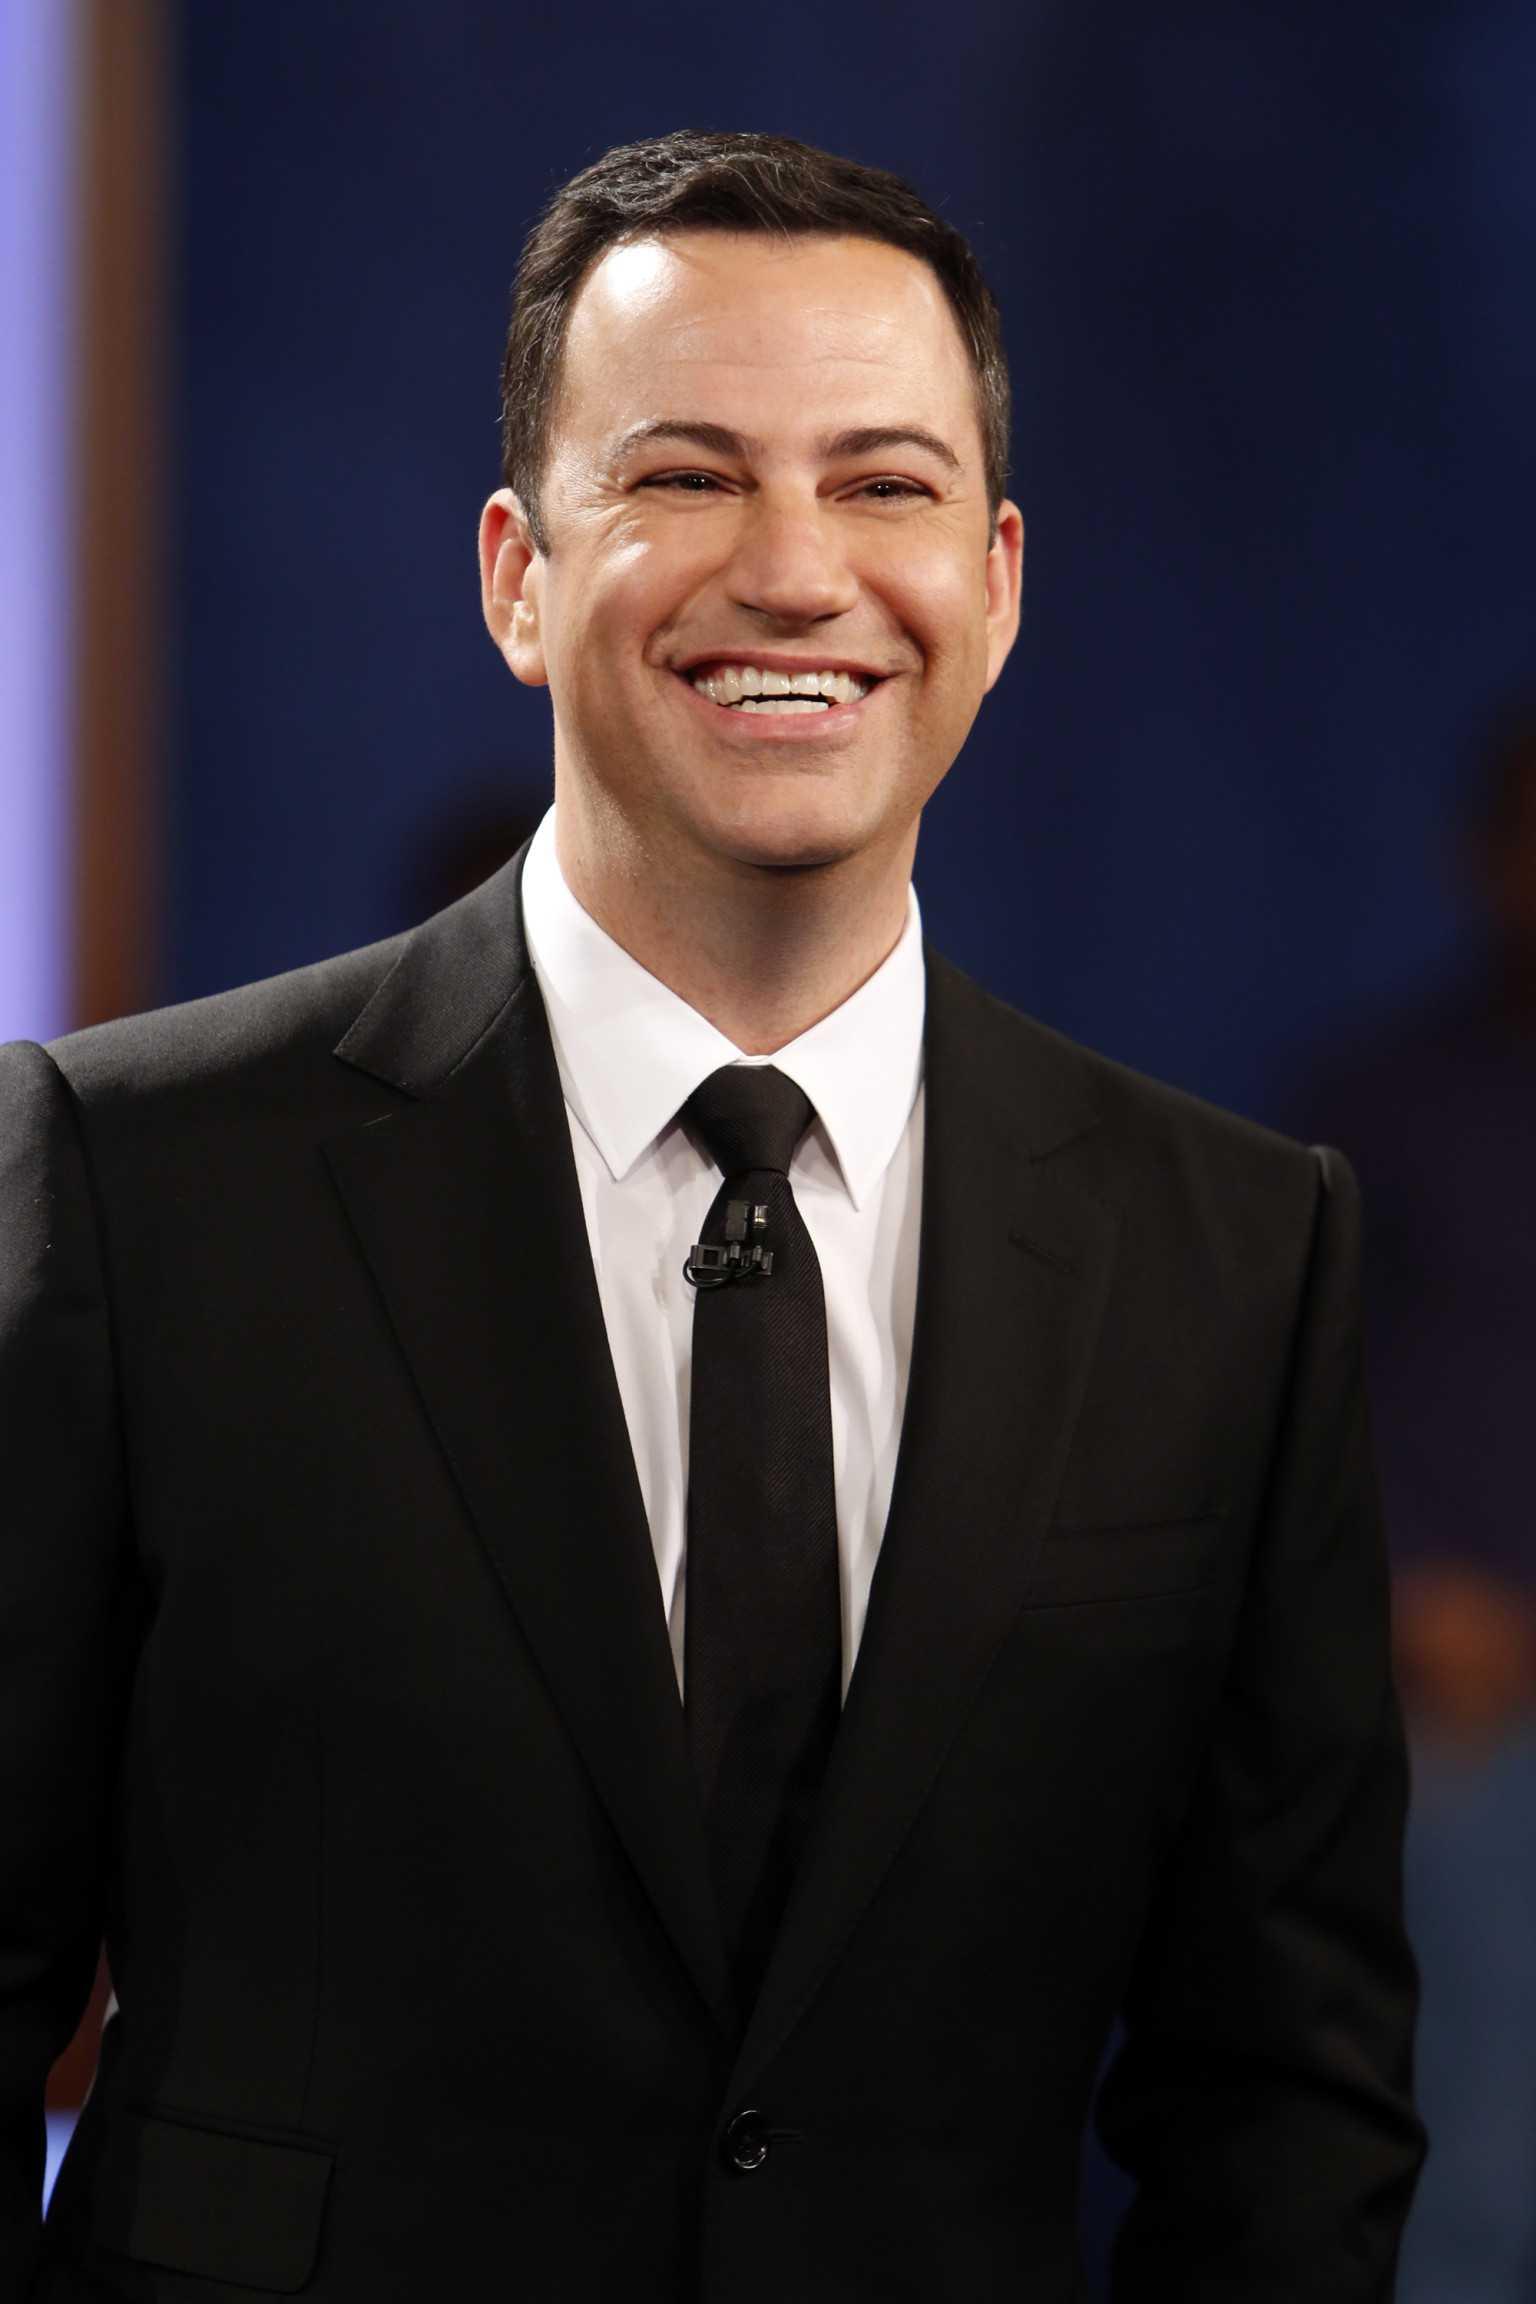 Jimmy Kimmel's Father's Day Challenge: Breakfast In The Shower! | Jimmy Kimmel